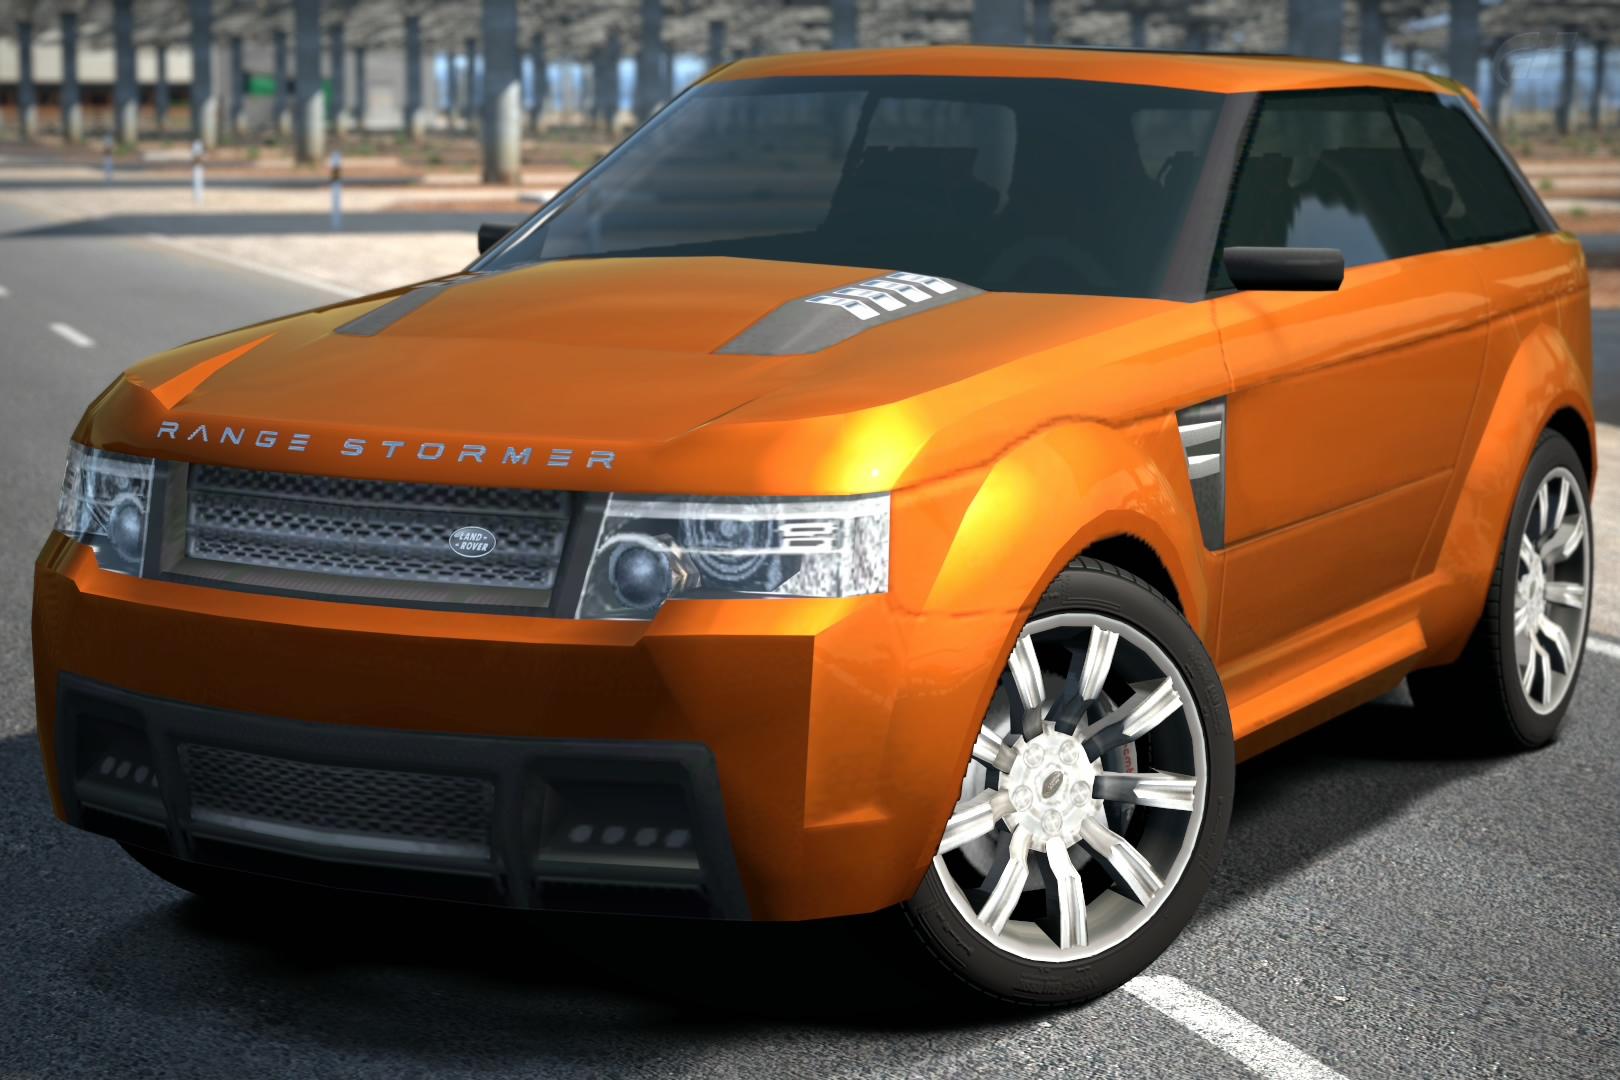 https://vignette.wikia.nocookie.net/gran-turismo/images/c/cf/Land_Rover_Range_Stormer_Concept_%2704.jpg/revision/latest?cb=20120501091203